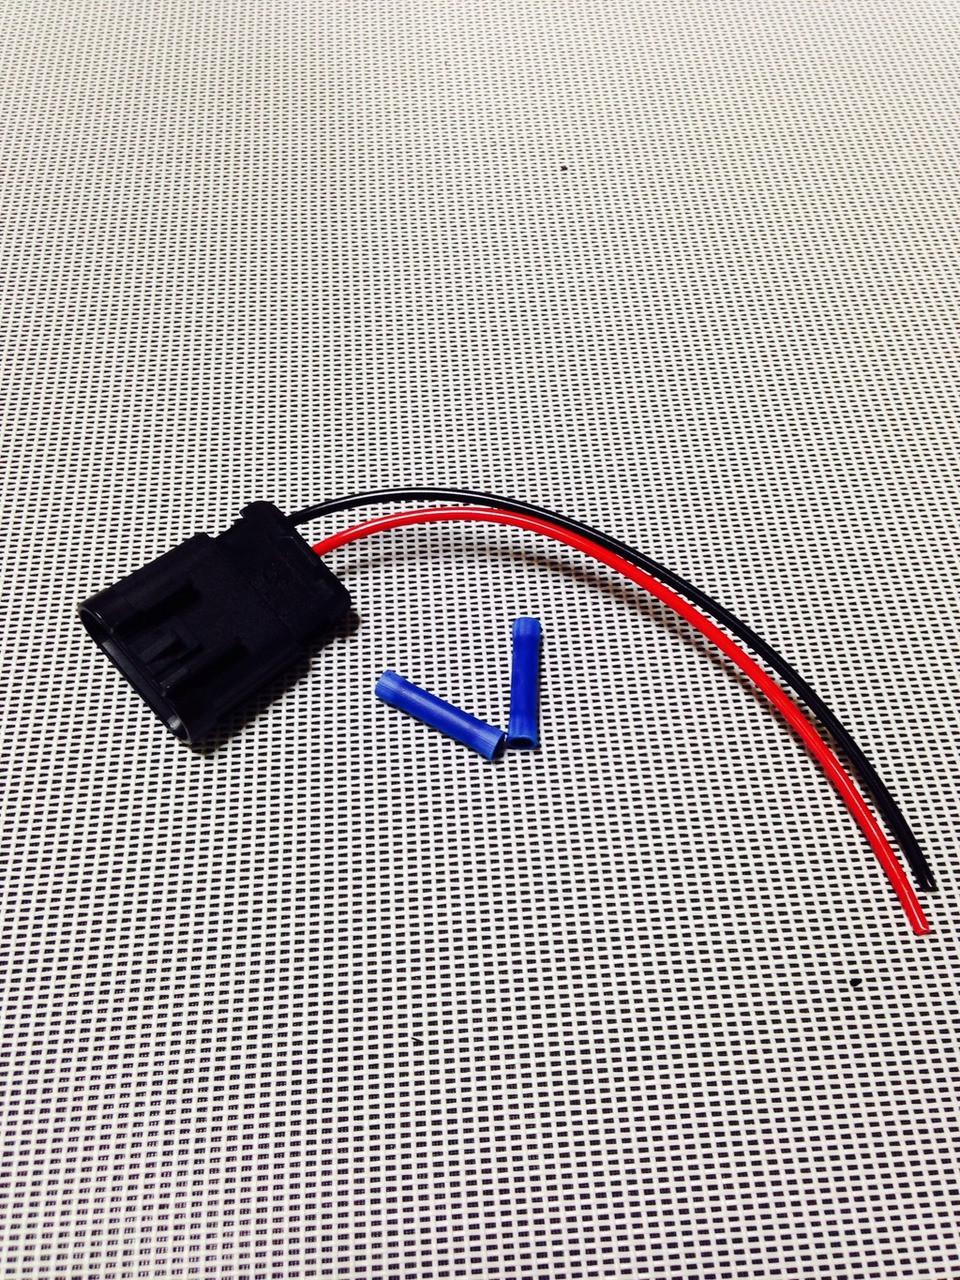 medium resolution of xm chassis led wiring harness plug kit price 25 00 image 1